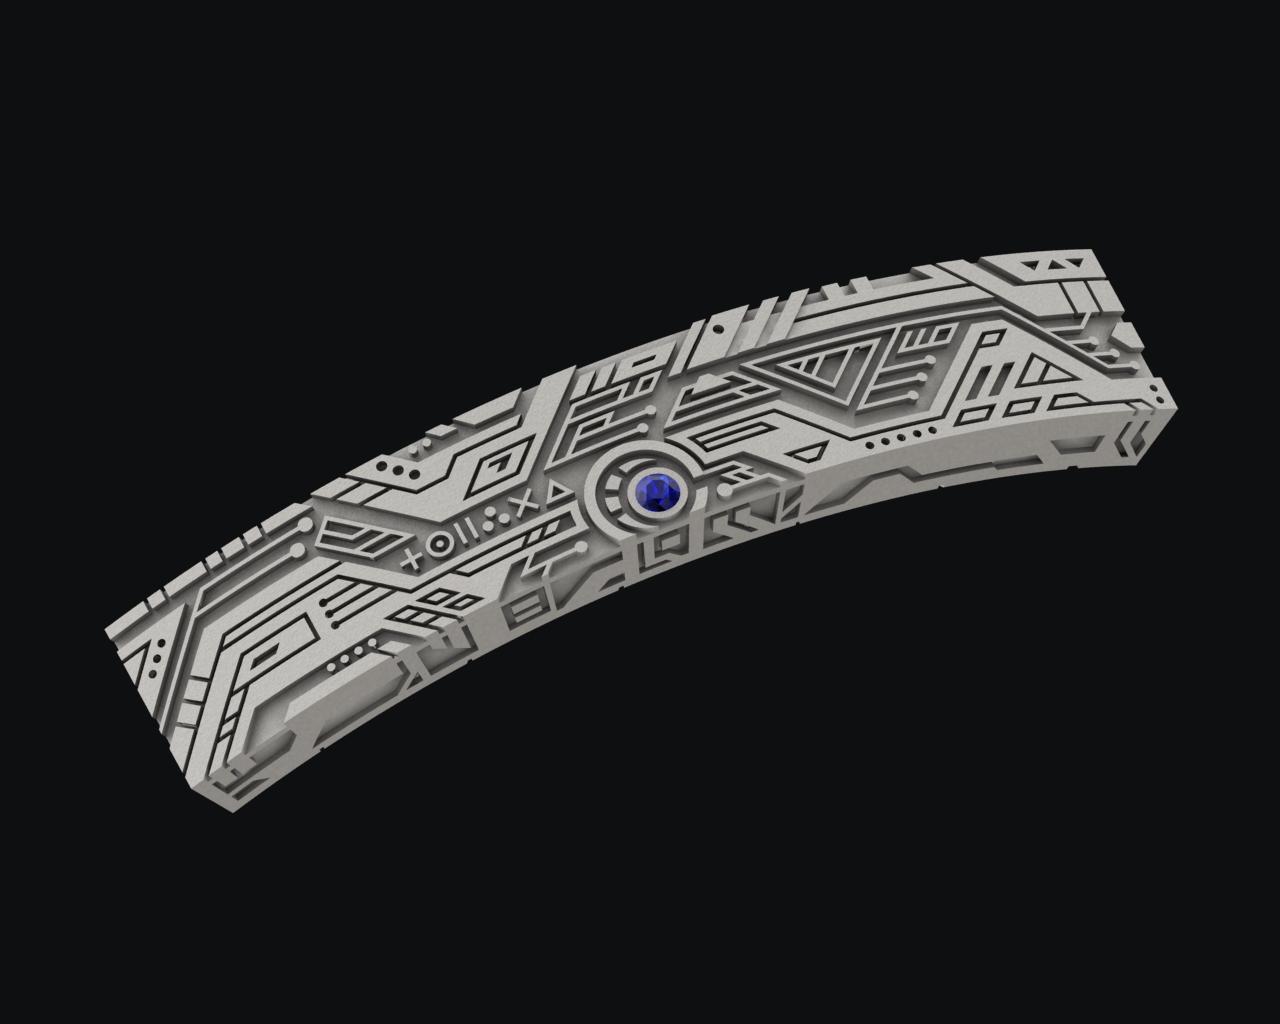 Techno Style Bracelet 3d Model 3d Printable Stl Cgtrader Com